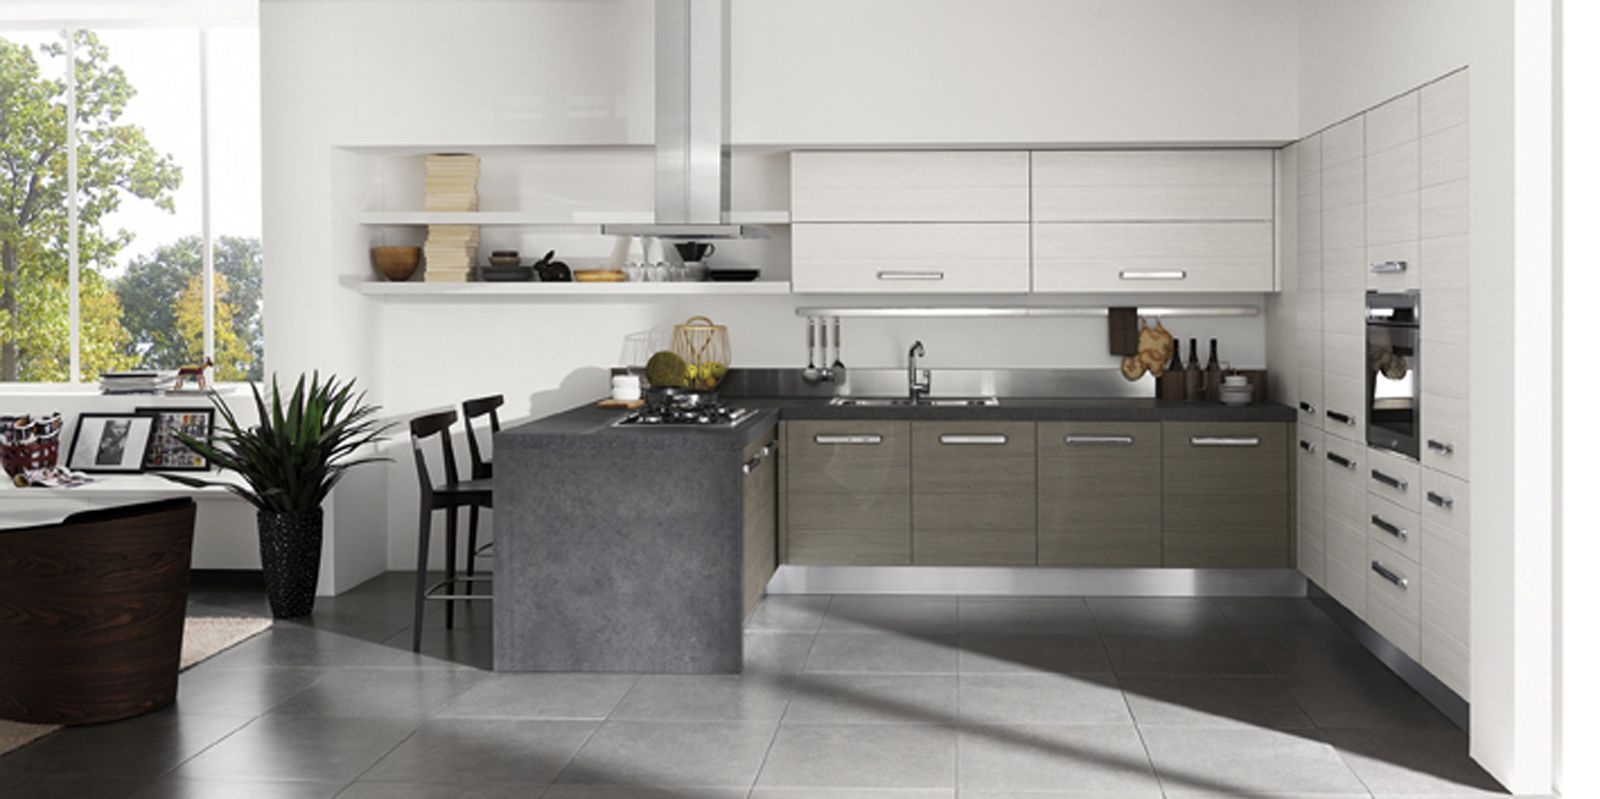 cucine a u moderne - Cerca con Google | Cucine casa | Pinterest ...